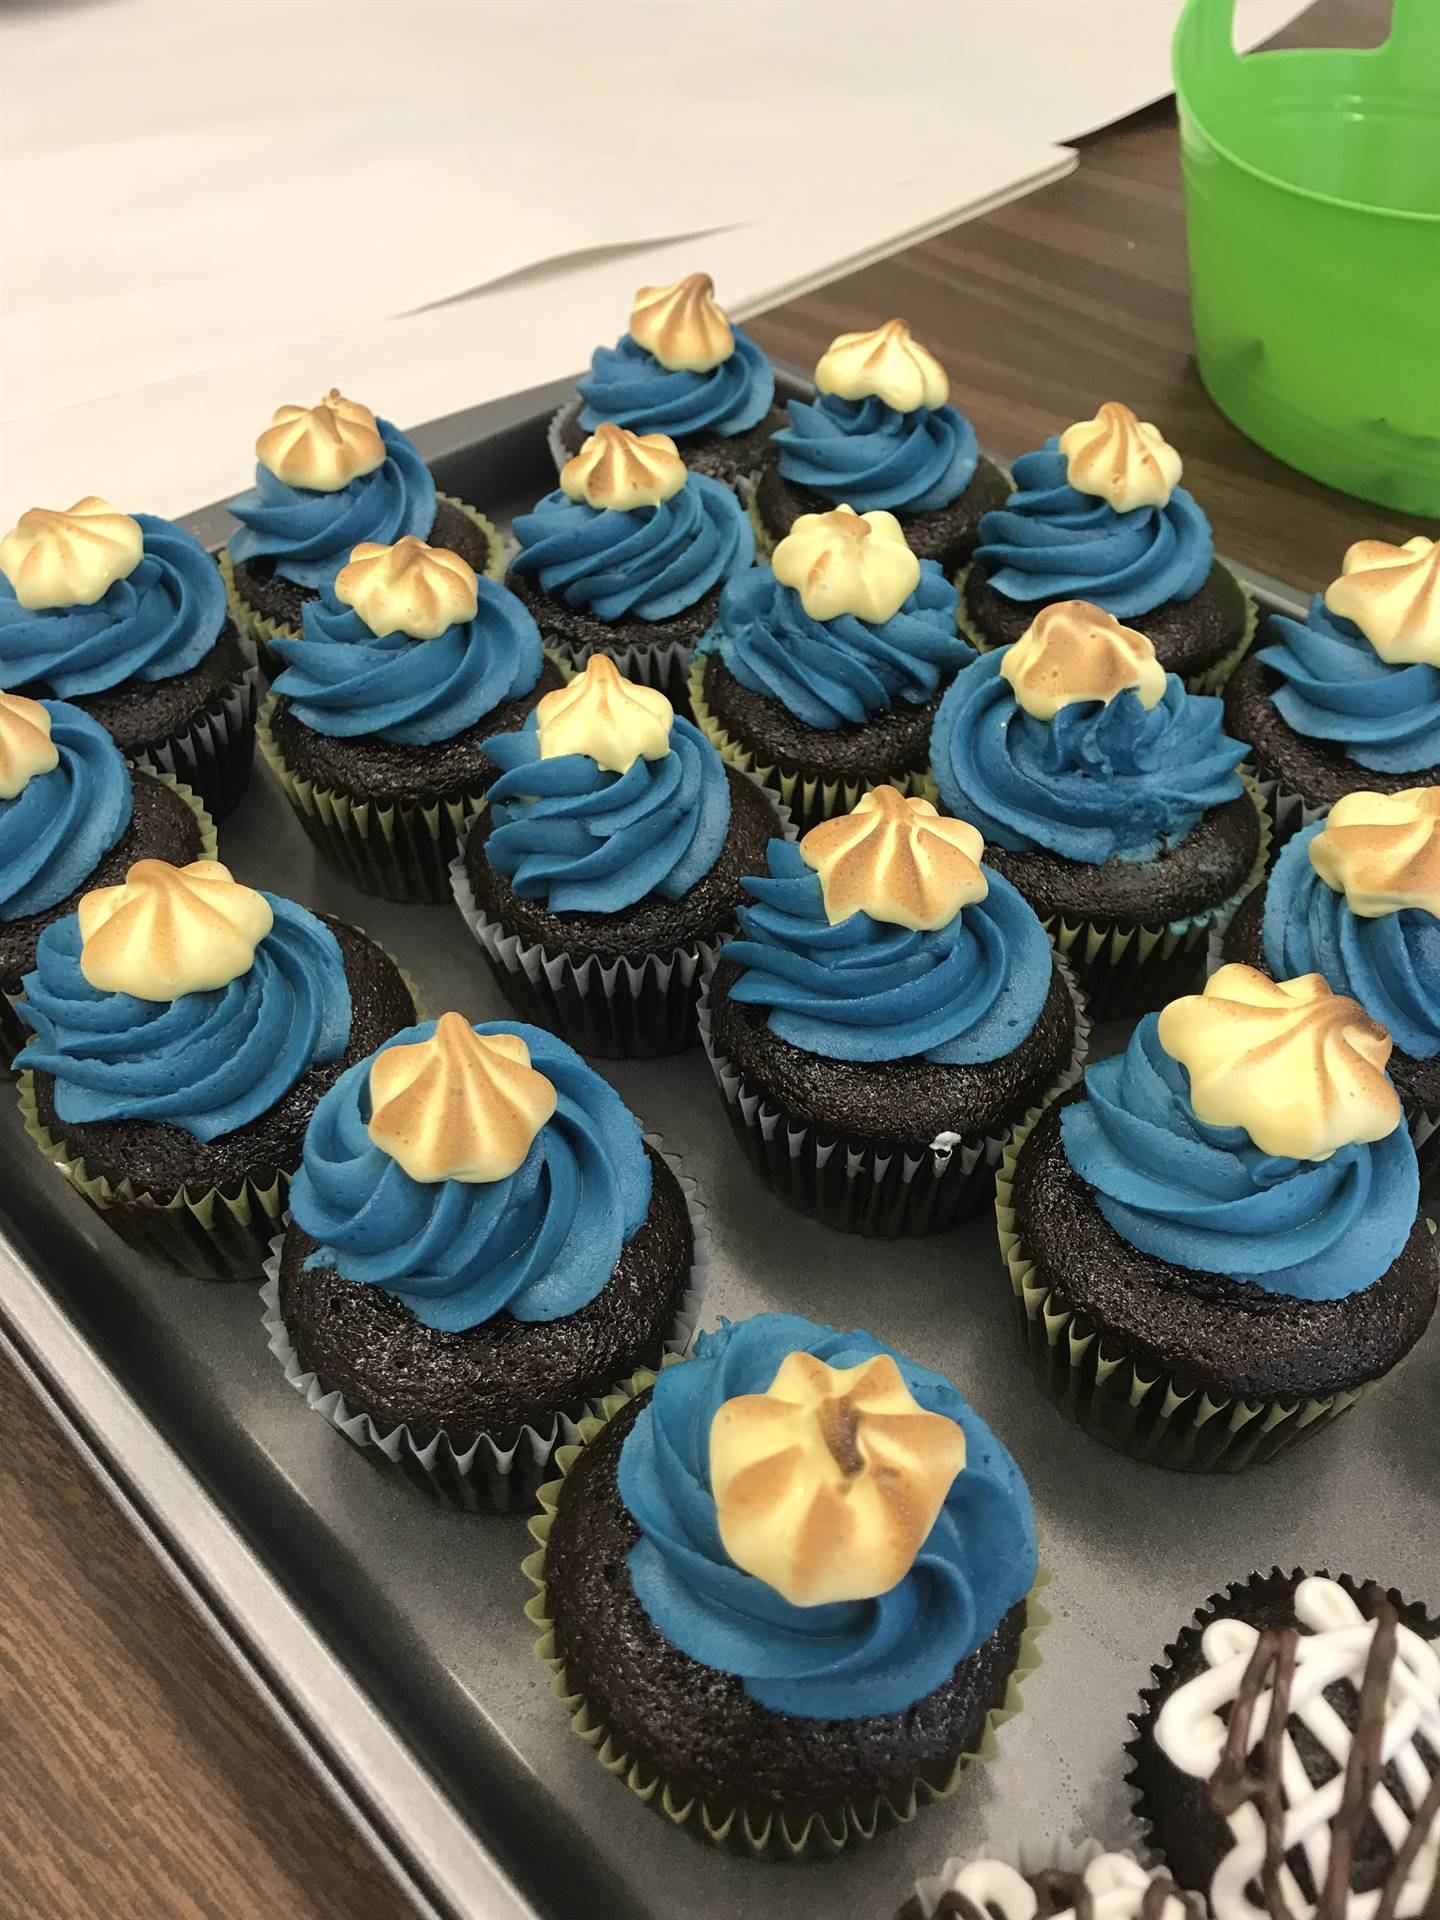 Food Tech - Bruleeing Marshmallow Meringue - May 2018